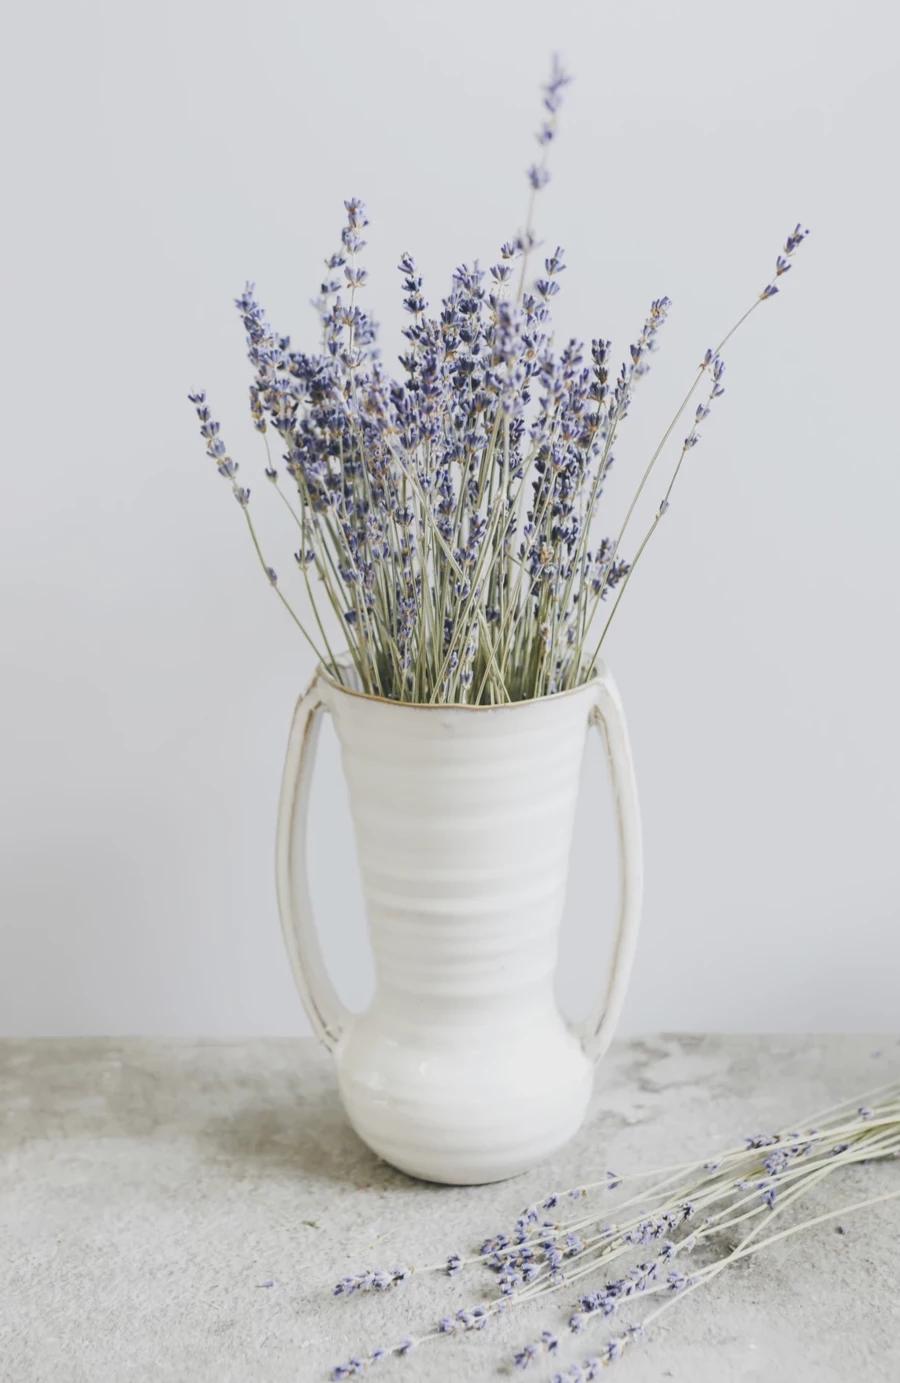 Farmhouse Ceramic Flower Vase With Handles 7 75 Tall Dried Flowers Dried Flower Arrangements Flower Vases